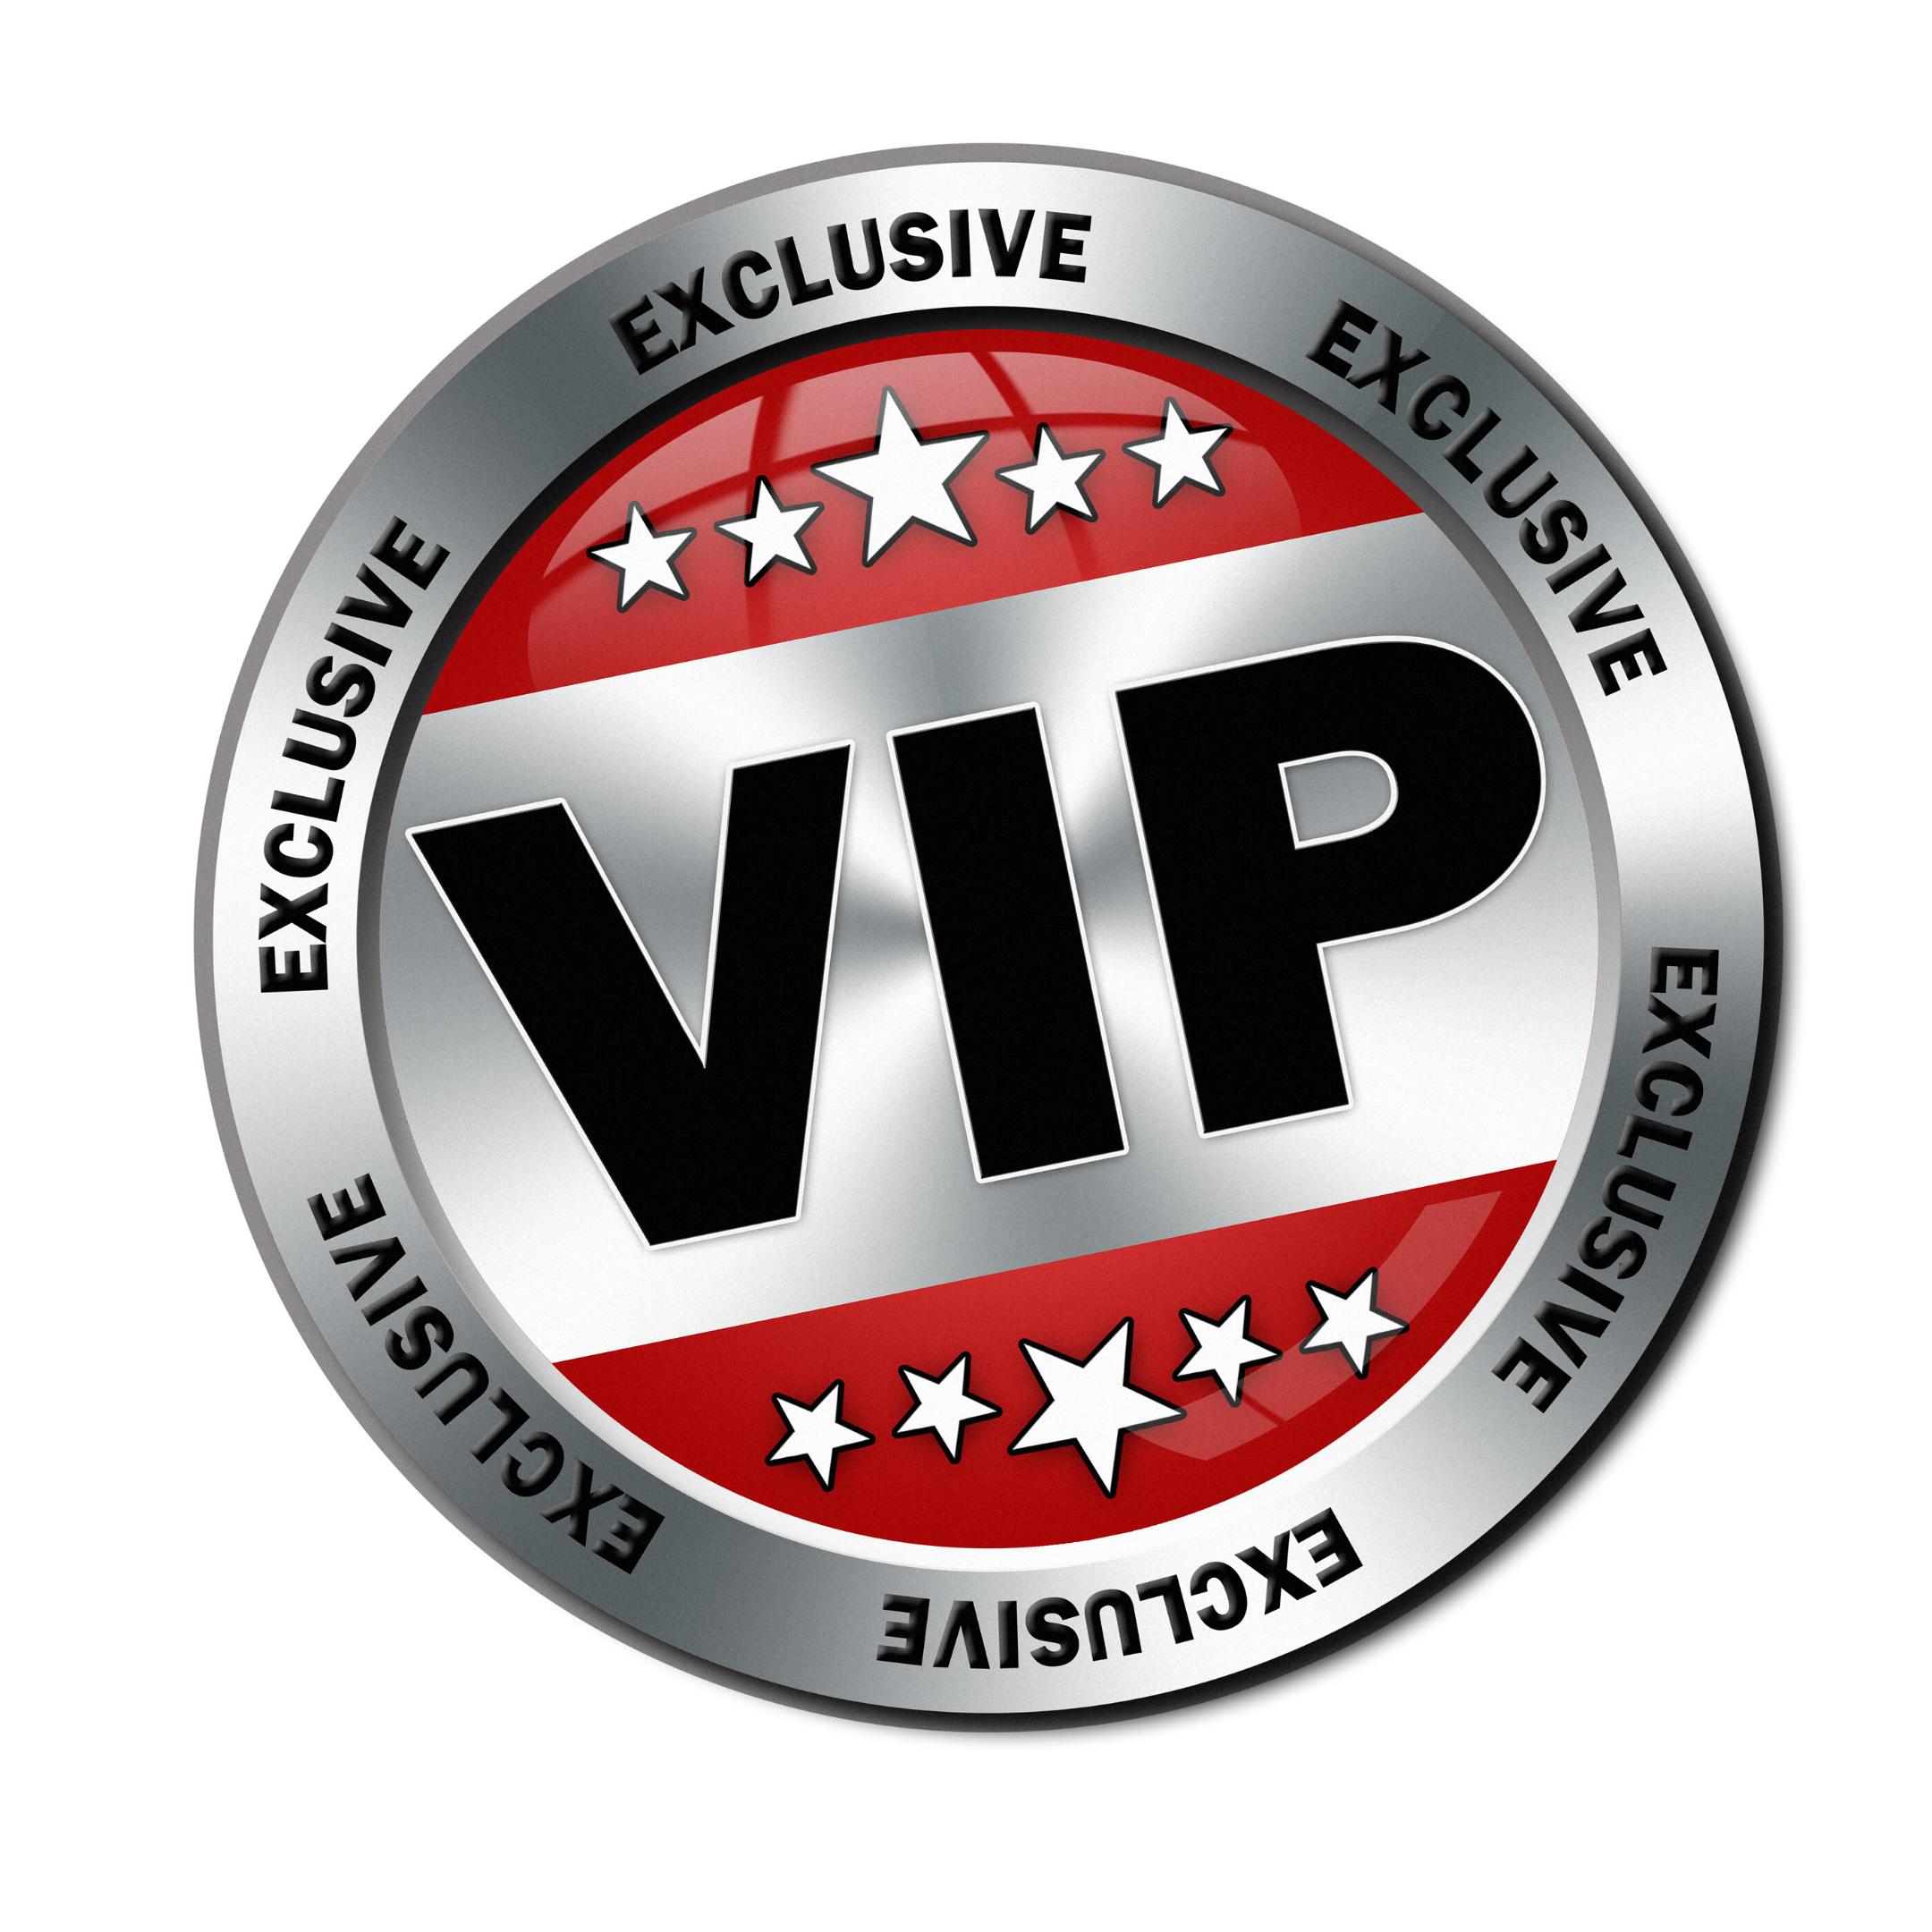 Travis Country Austin TX Resident VIP